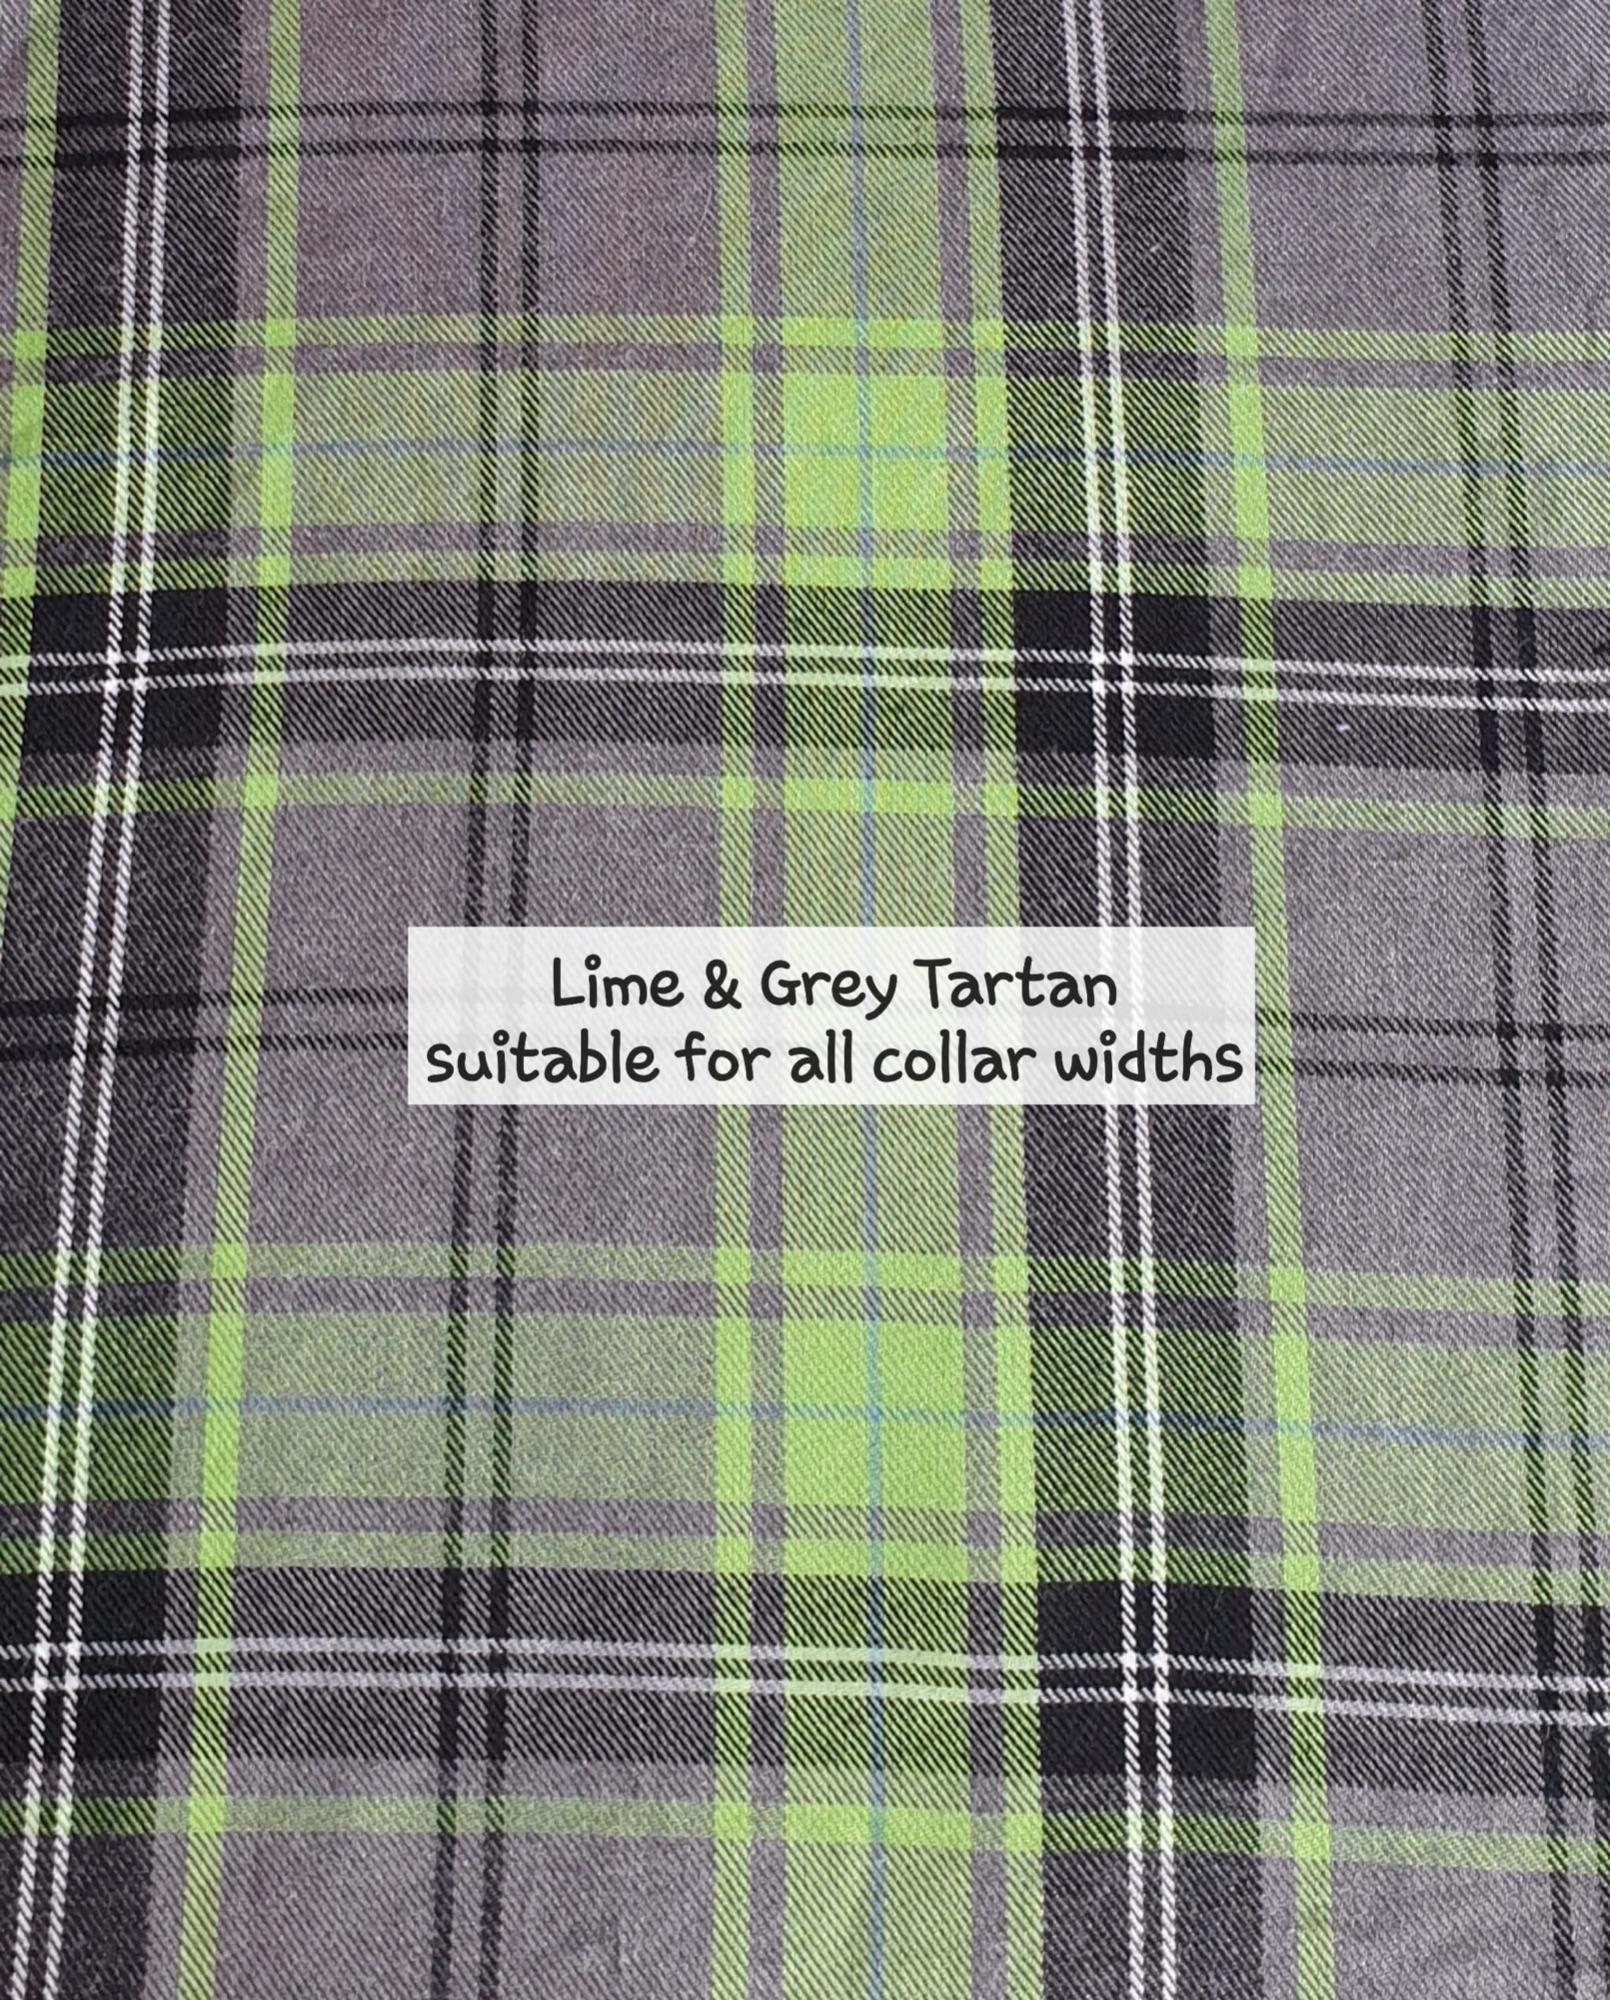 Lime & Grey Tartan